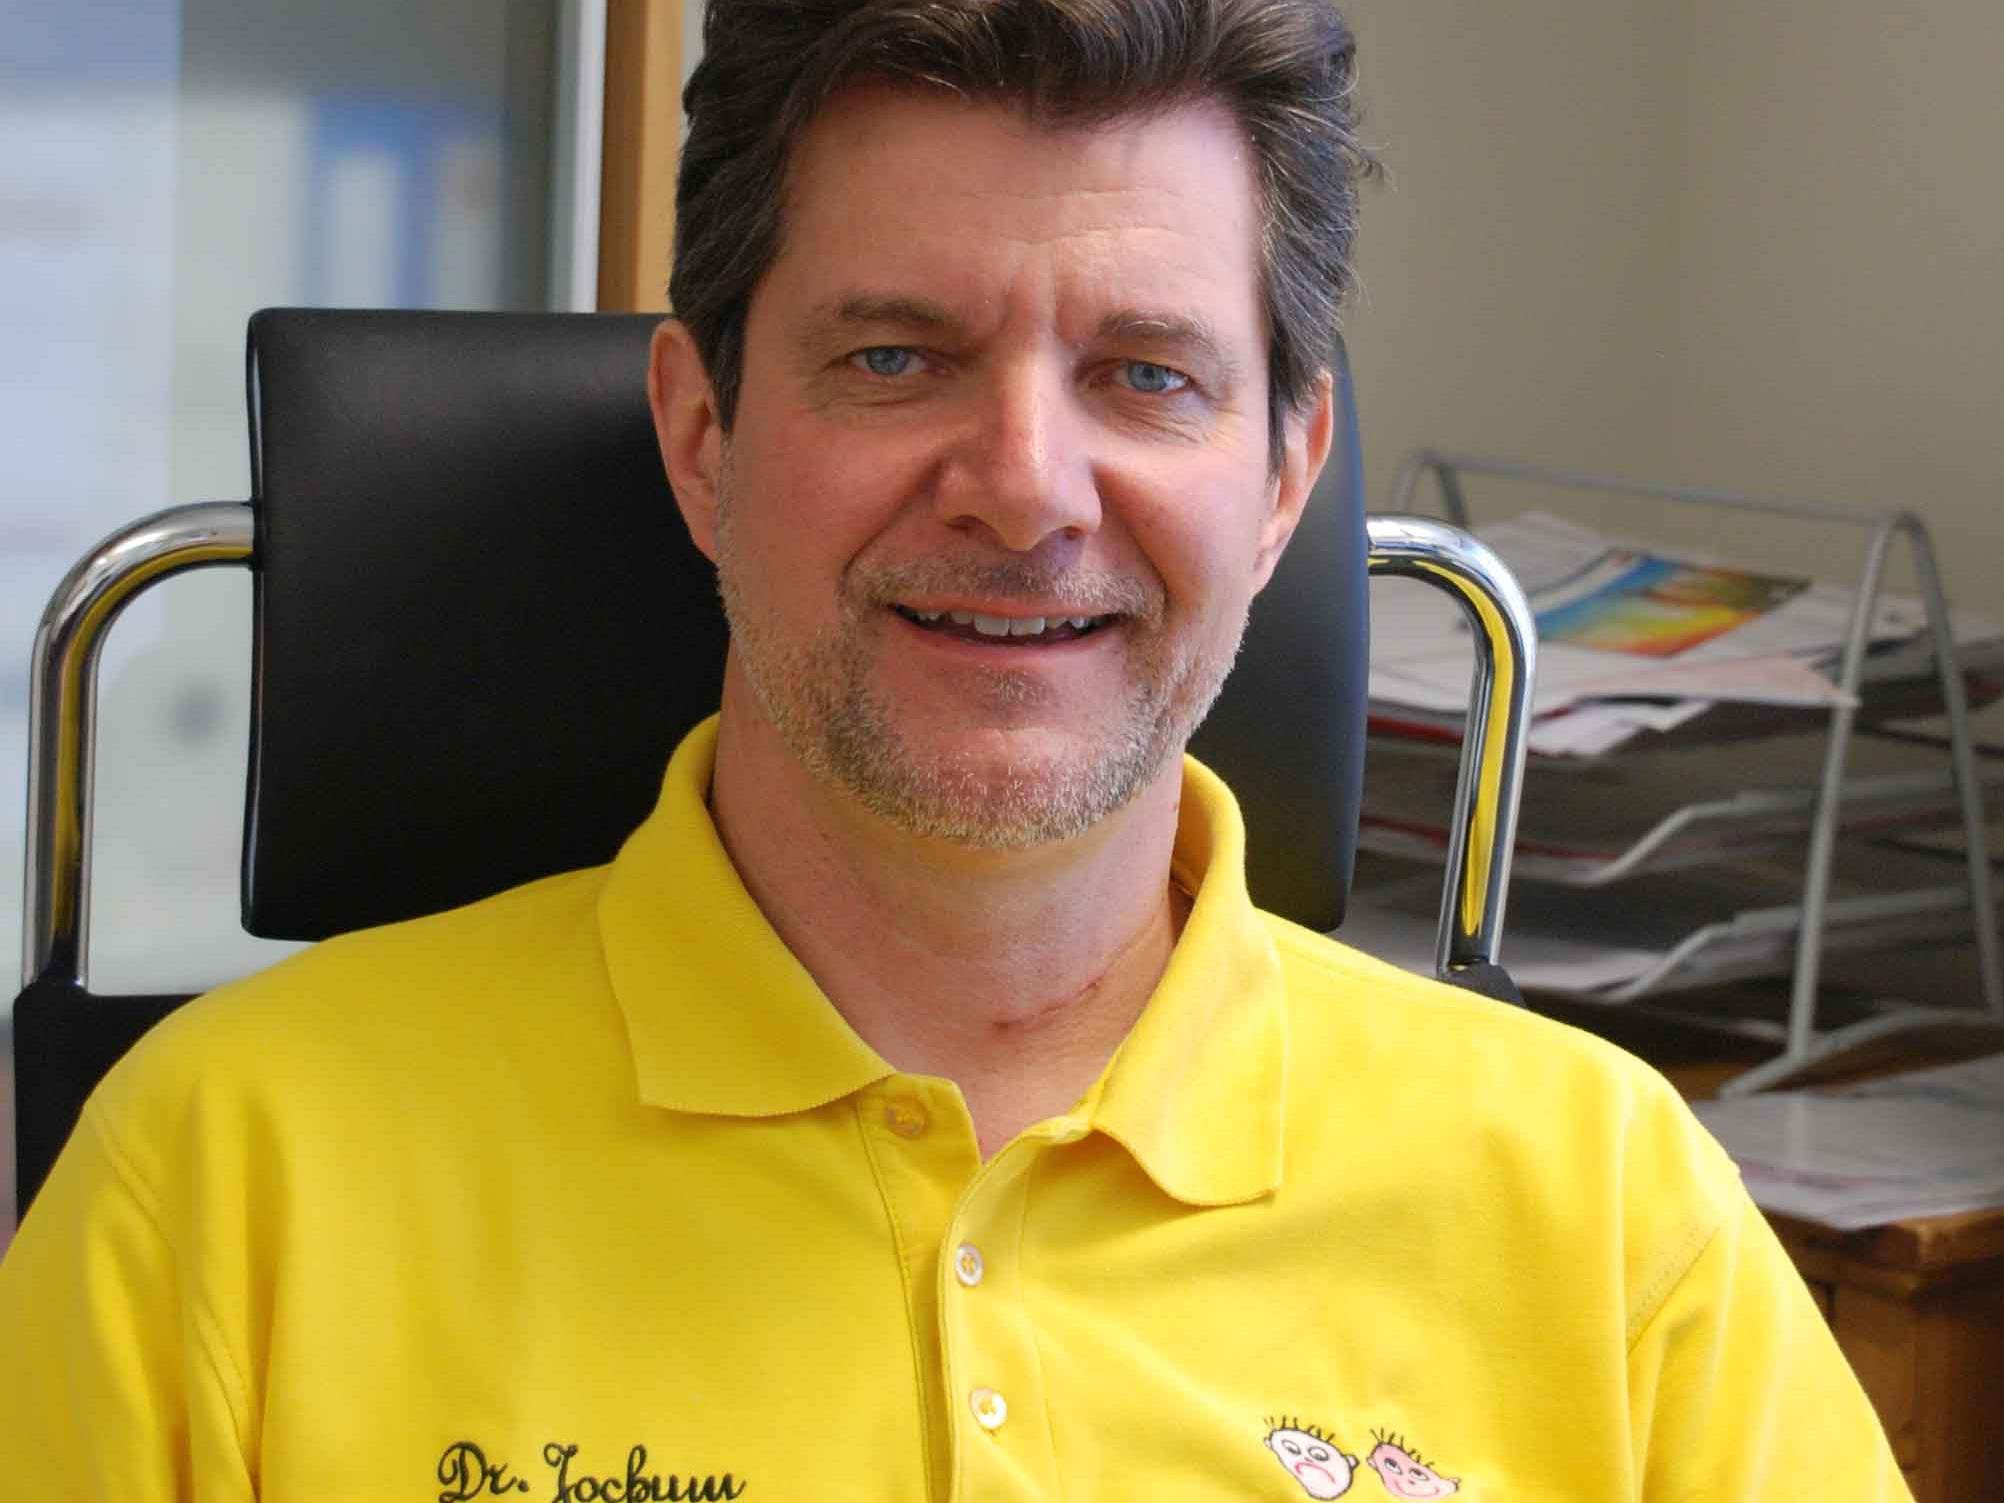 Dr. Bernhard Jochum